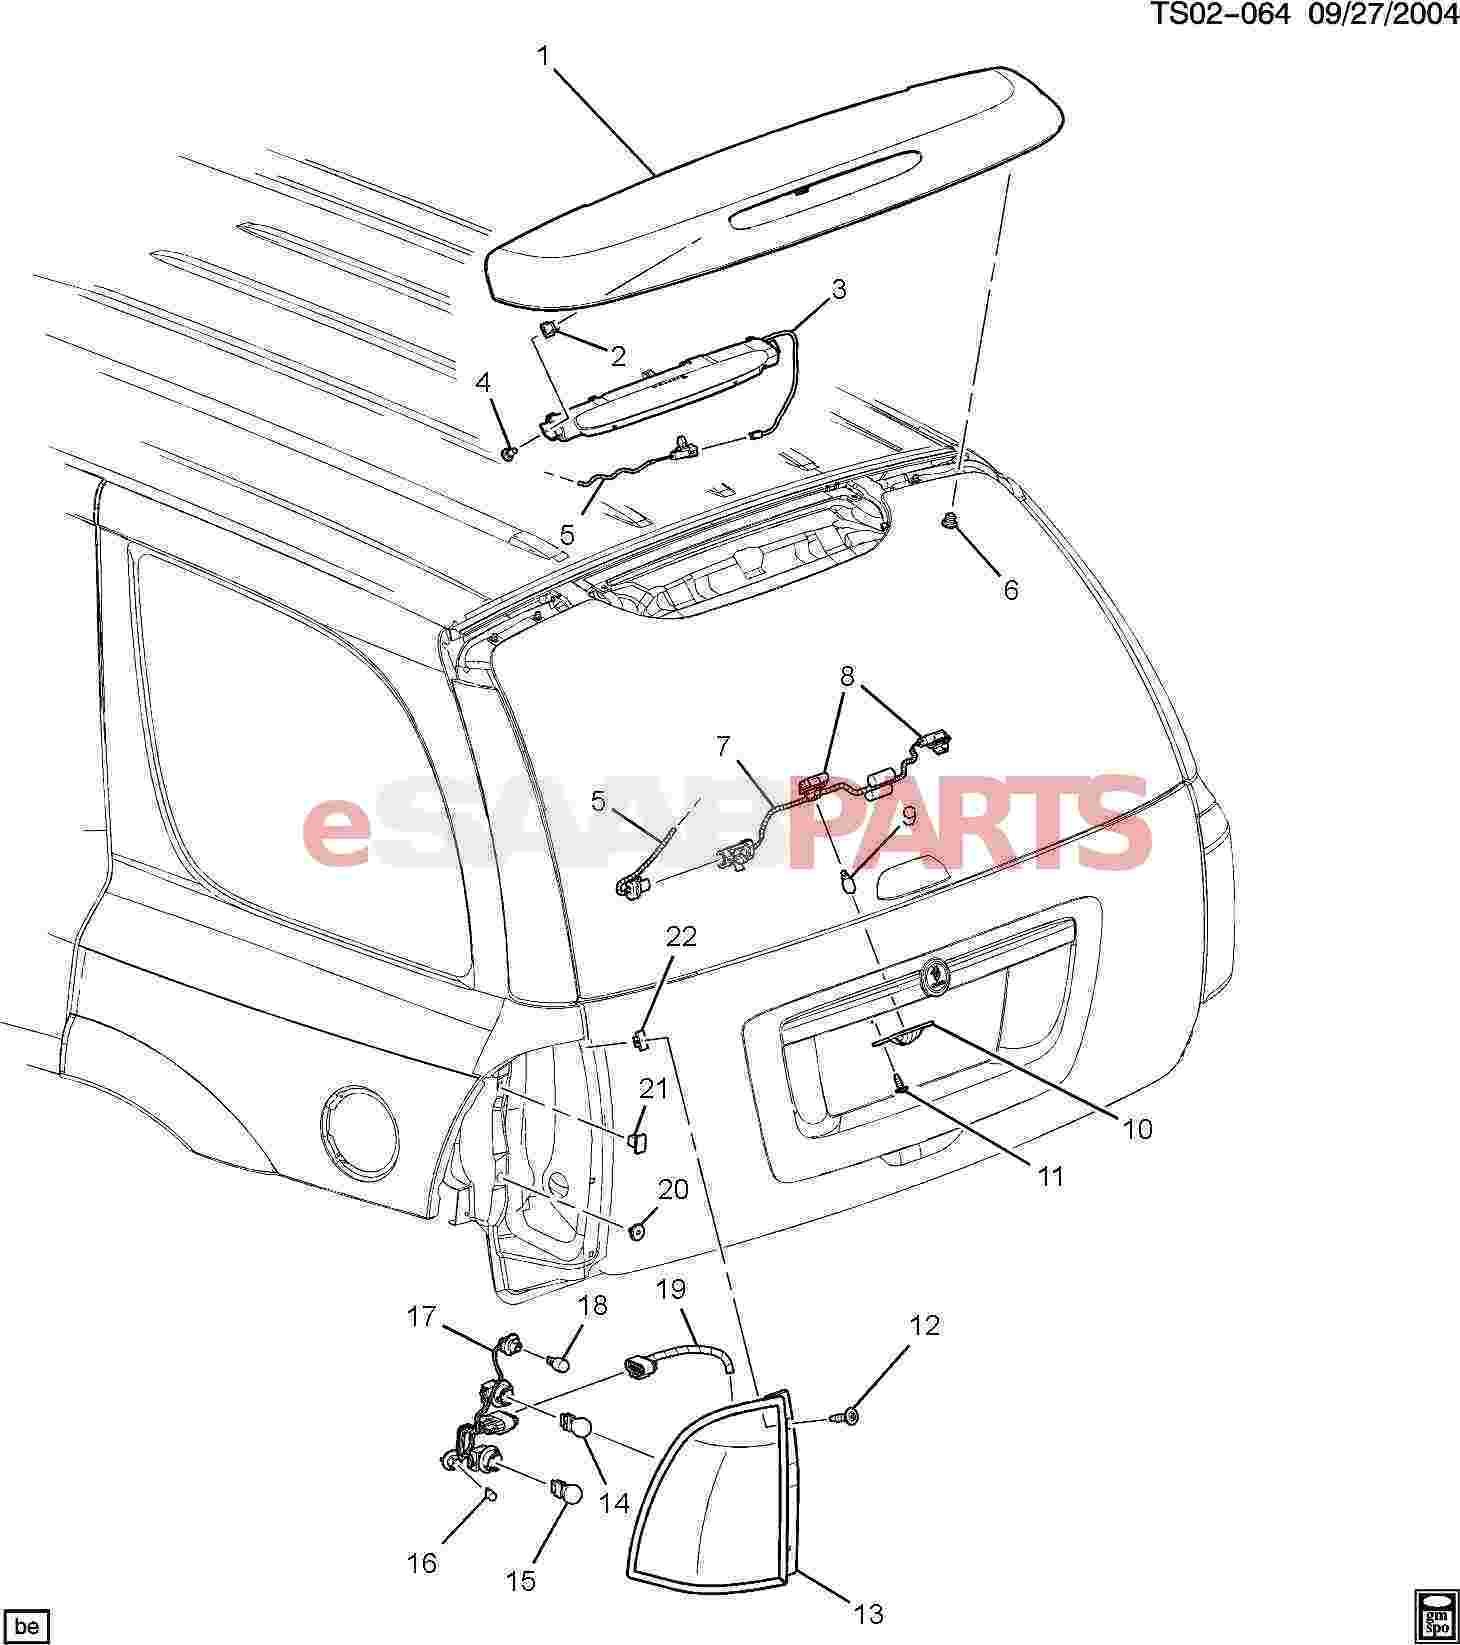 esaabparts saab 9 7x electrical parts lights related Simple Turn Signal Diagram esaabparts saab 9 7x electrical parts lights related l s rear